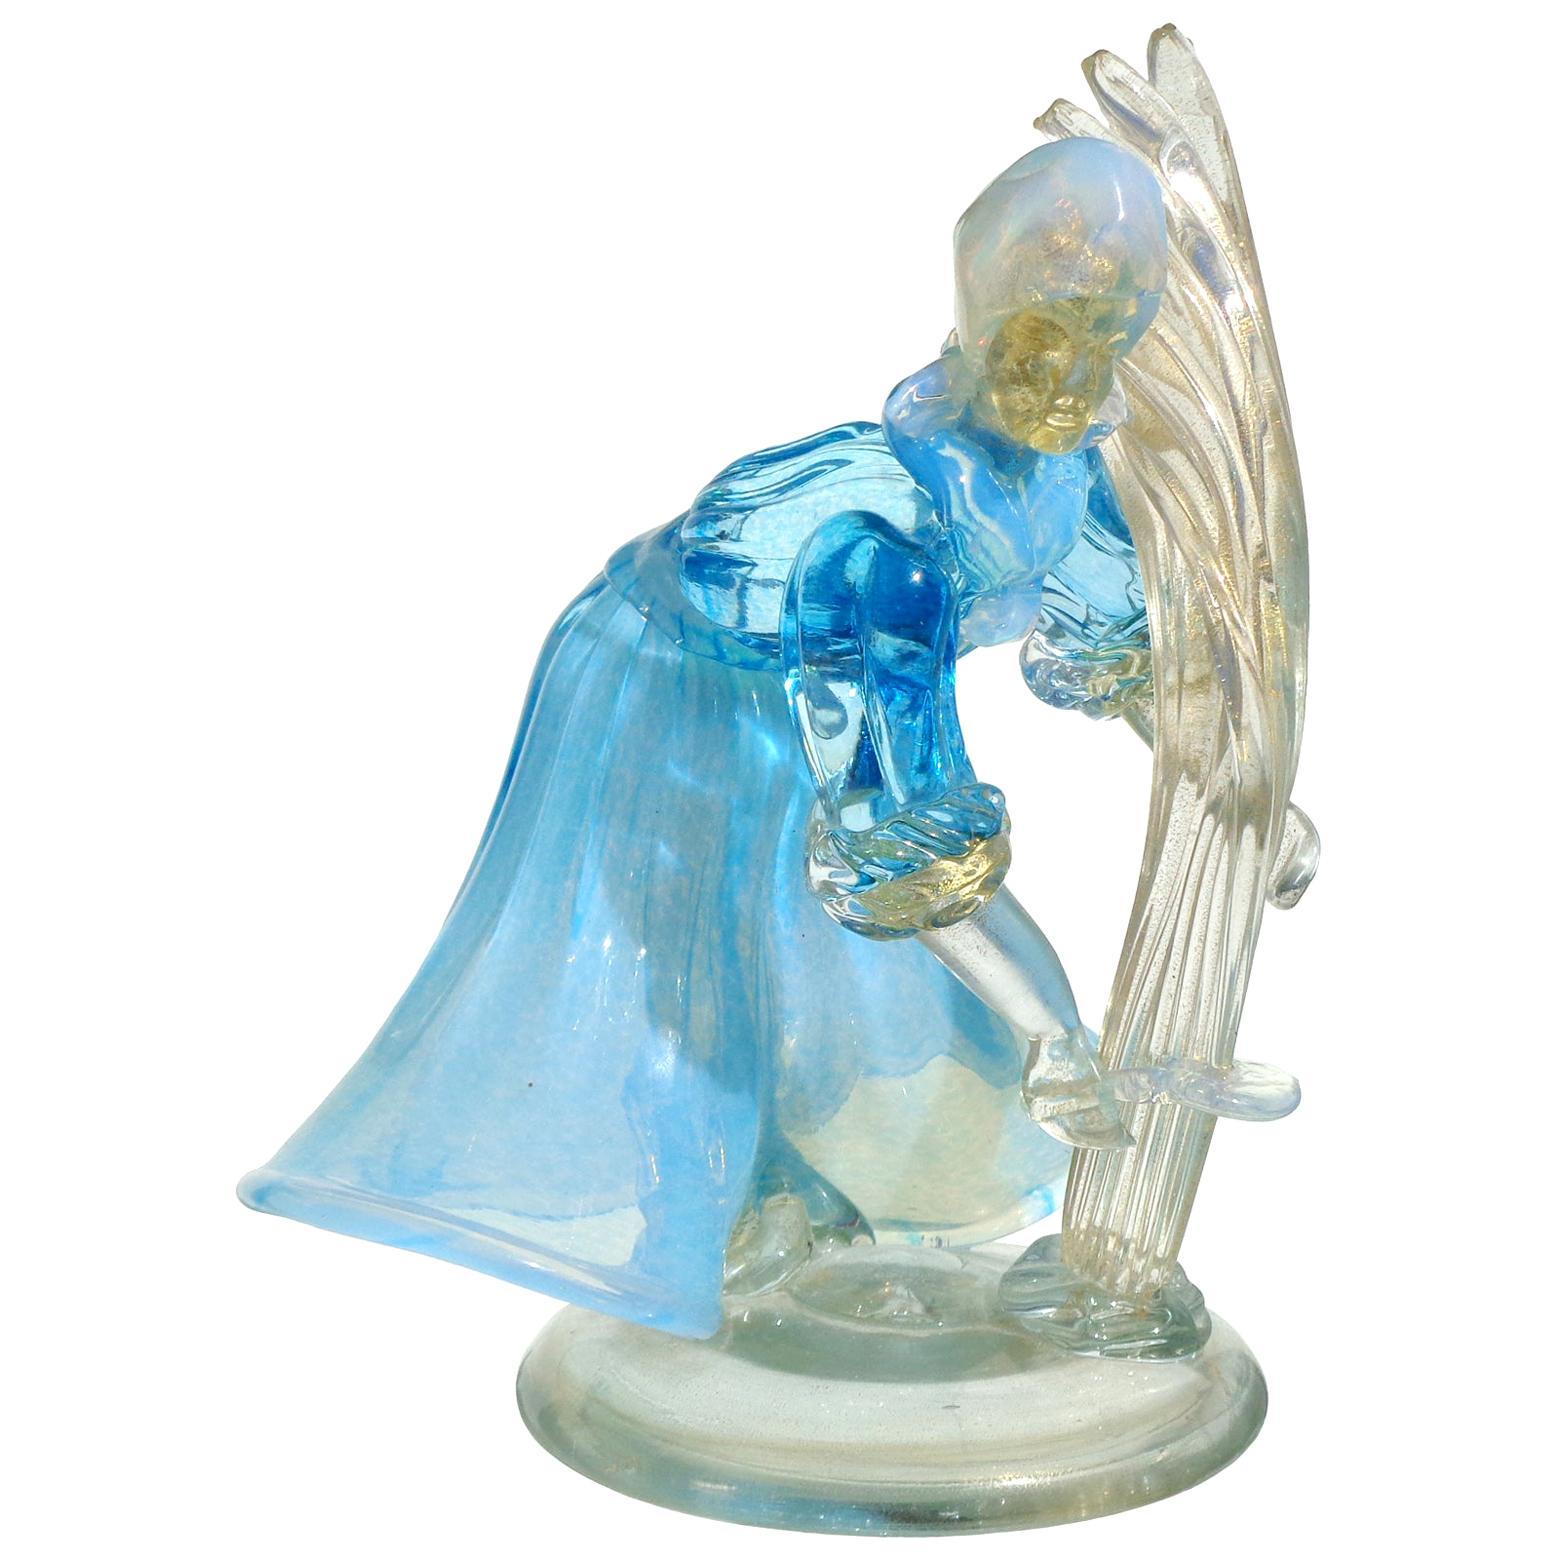 Murano Opalescent Blue White Gold Flecks Italian Art Glass Farmer Sculpture